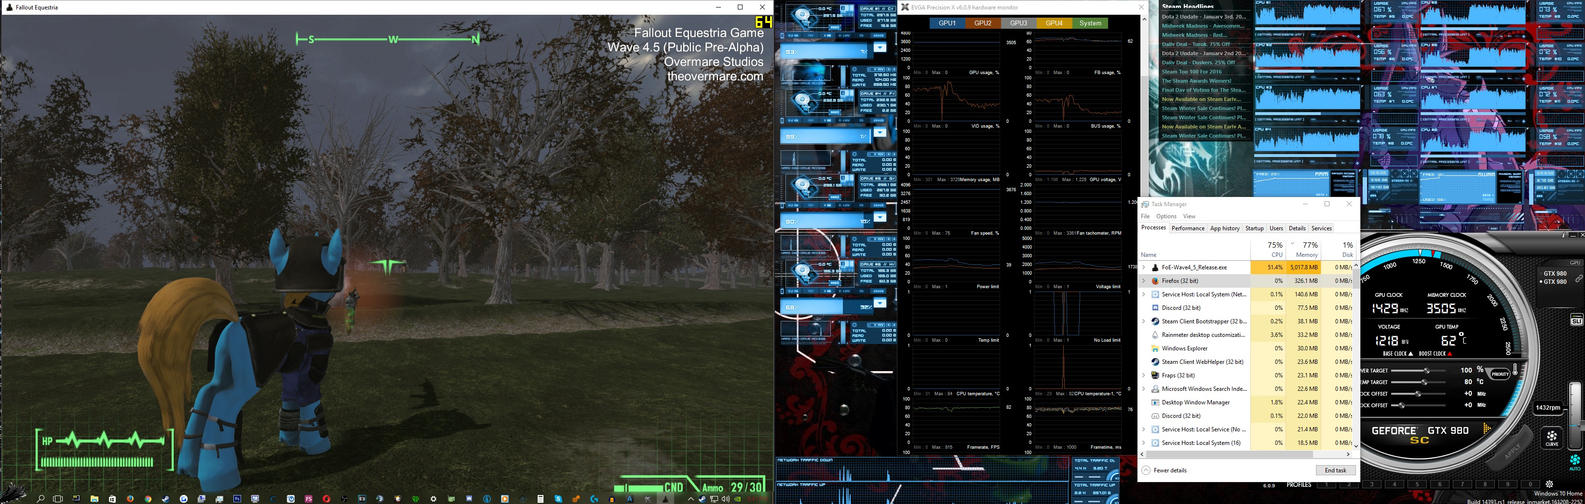 Screenshot1 by Q13E5